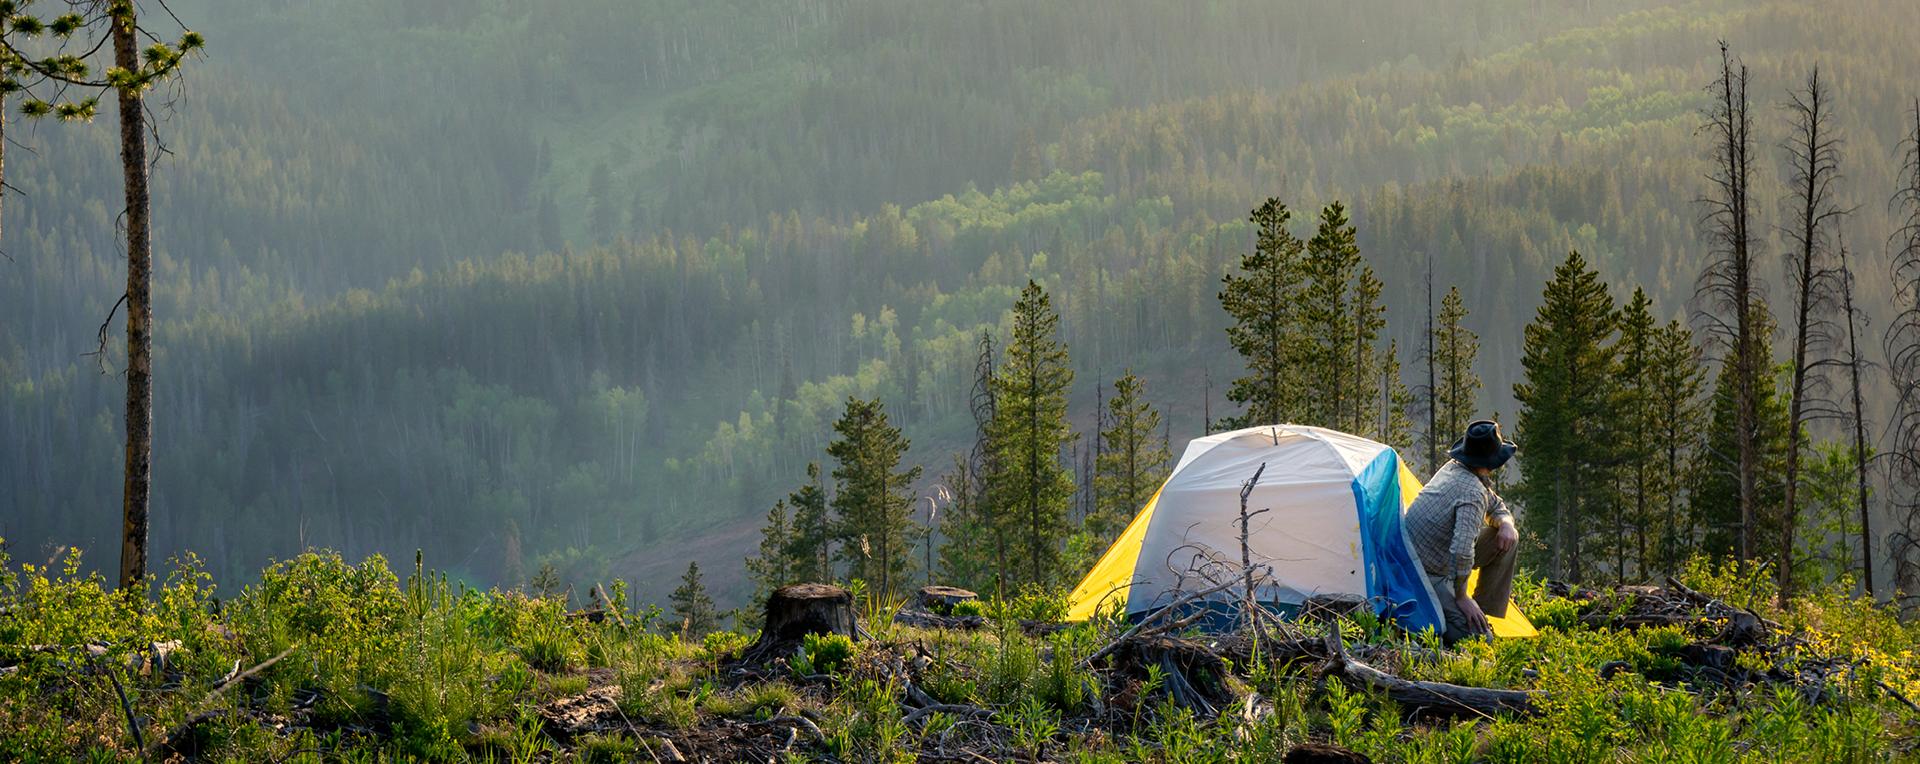 Meteor 3 Tent: Best For Backpacking - Men's Journal